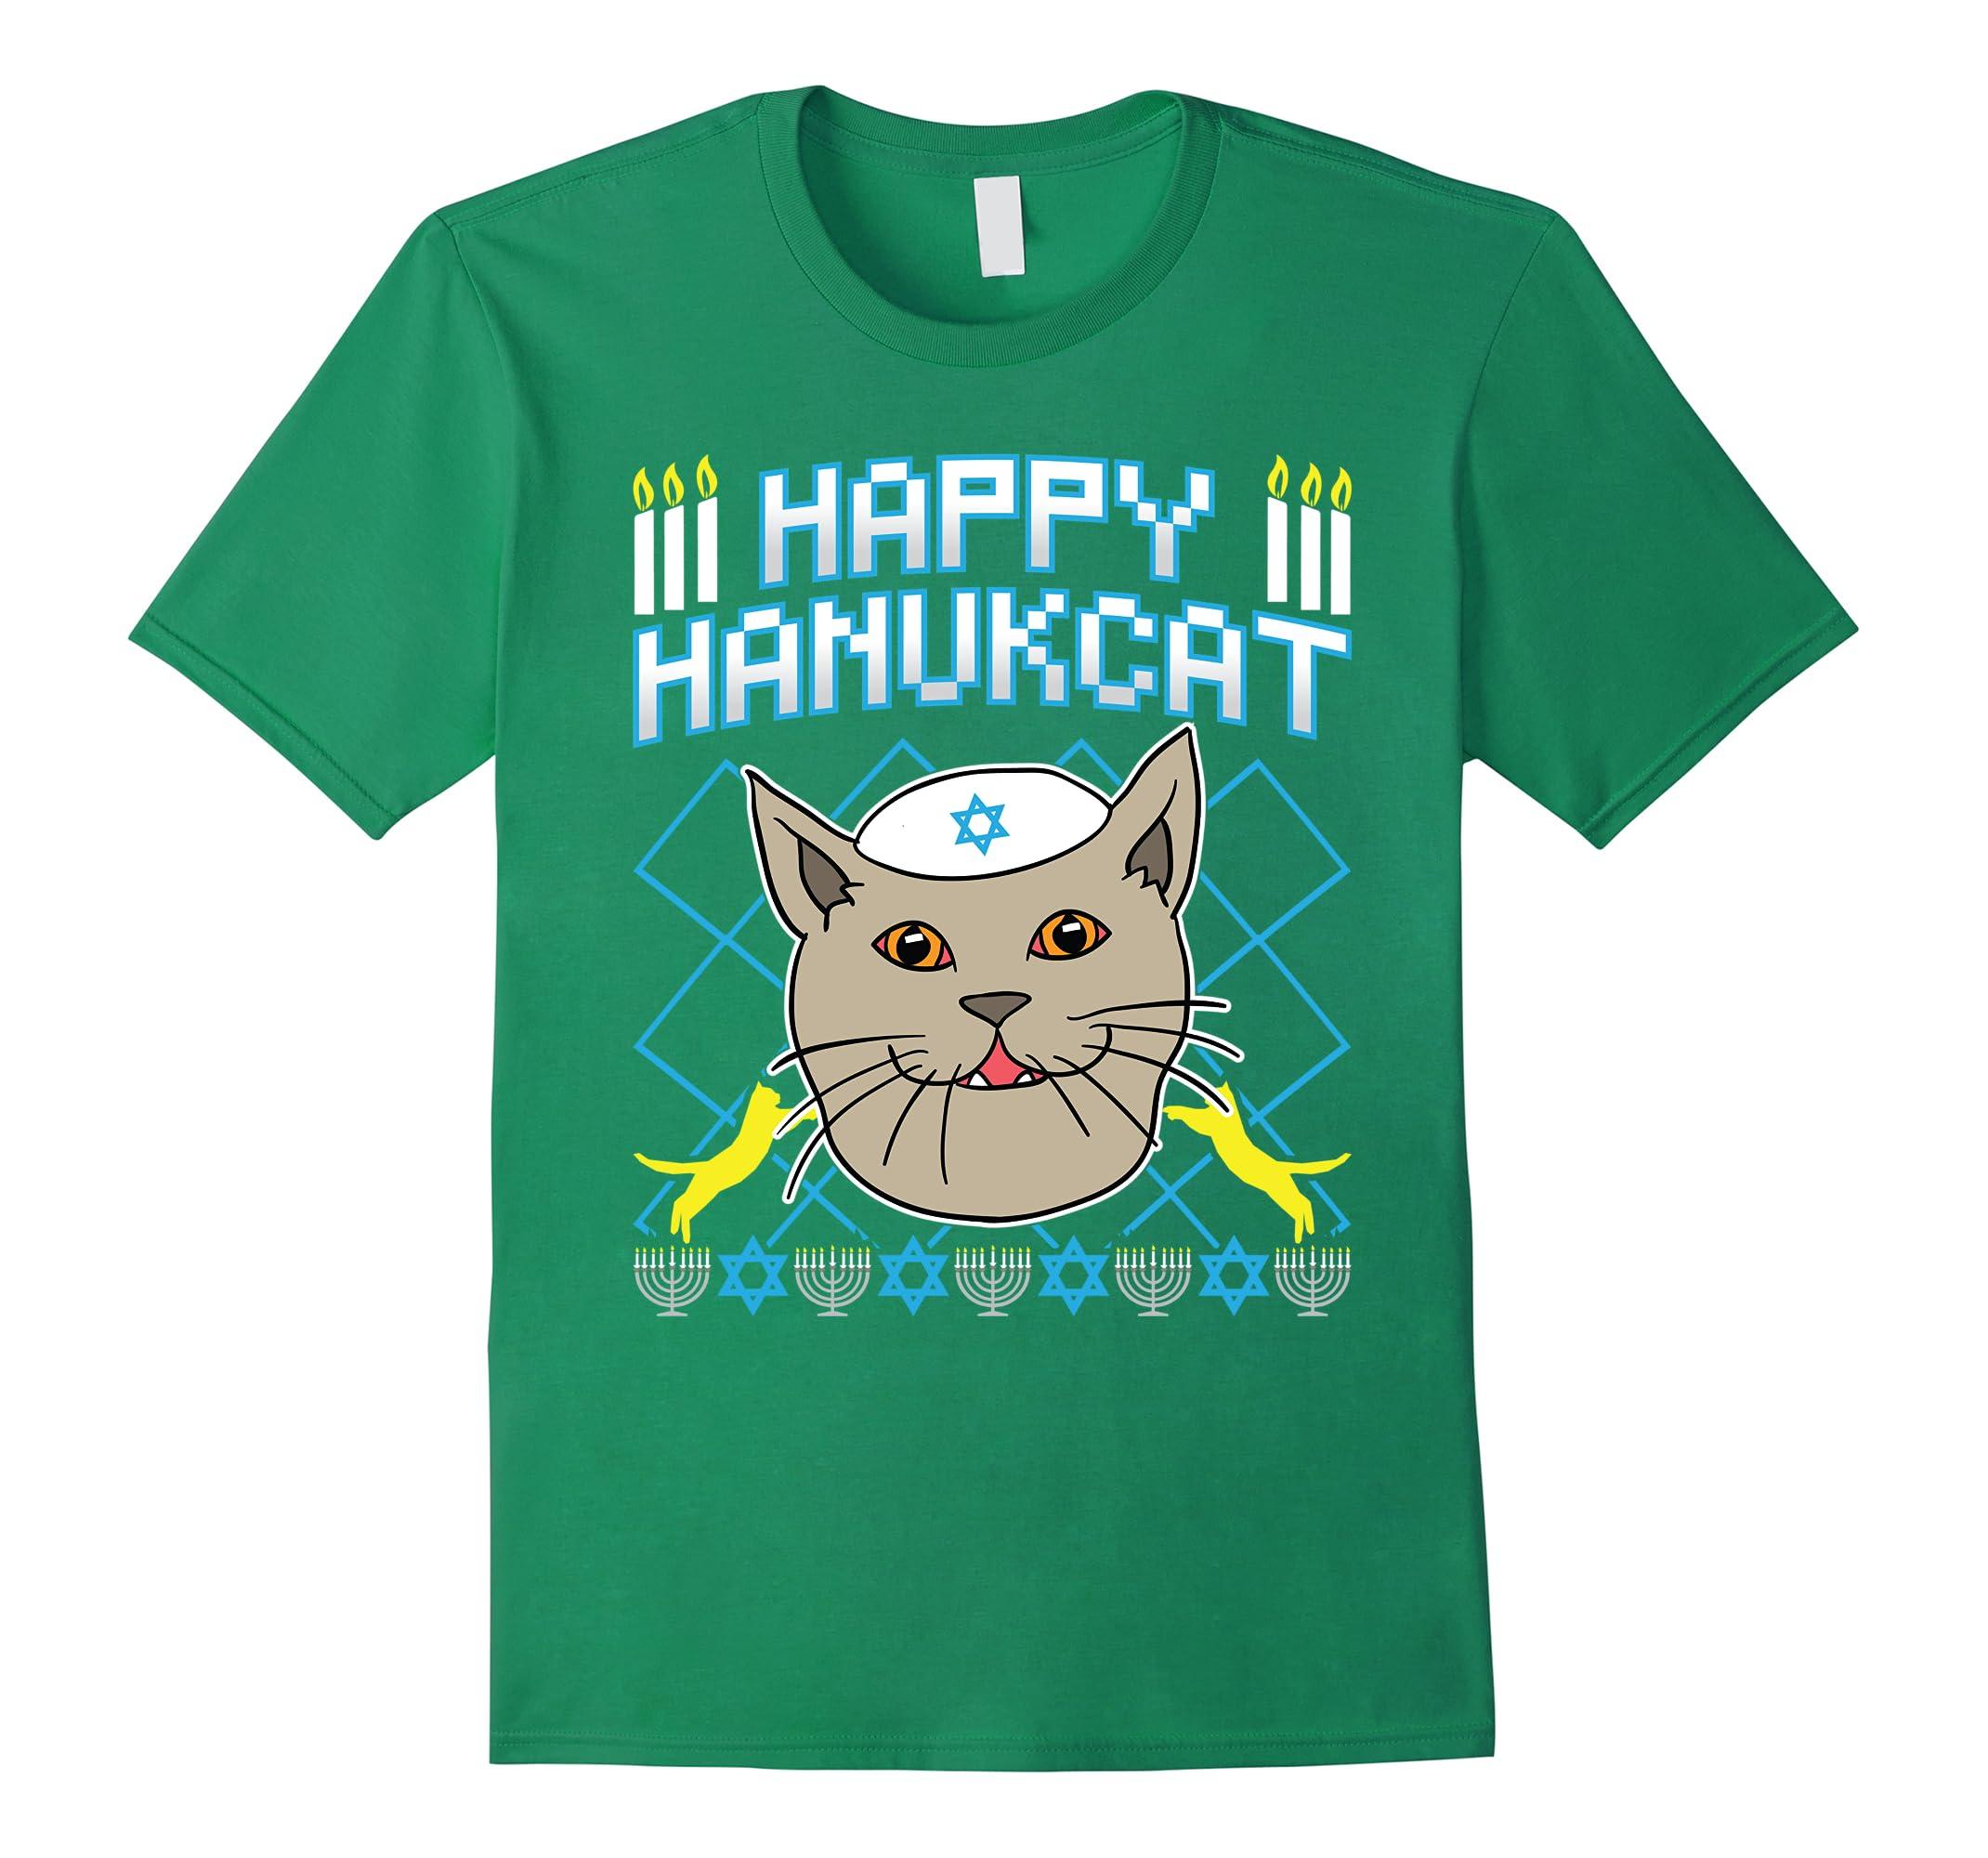 Jewish Christmas Sweater.Happy Hanukcat Shirt Jewish Ugly Cat Christmas Sweater Shirt Rt